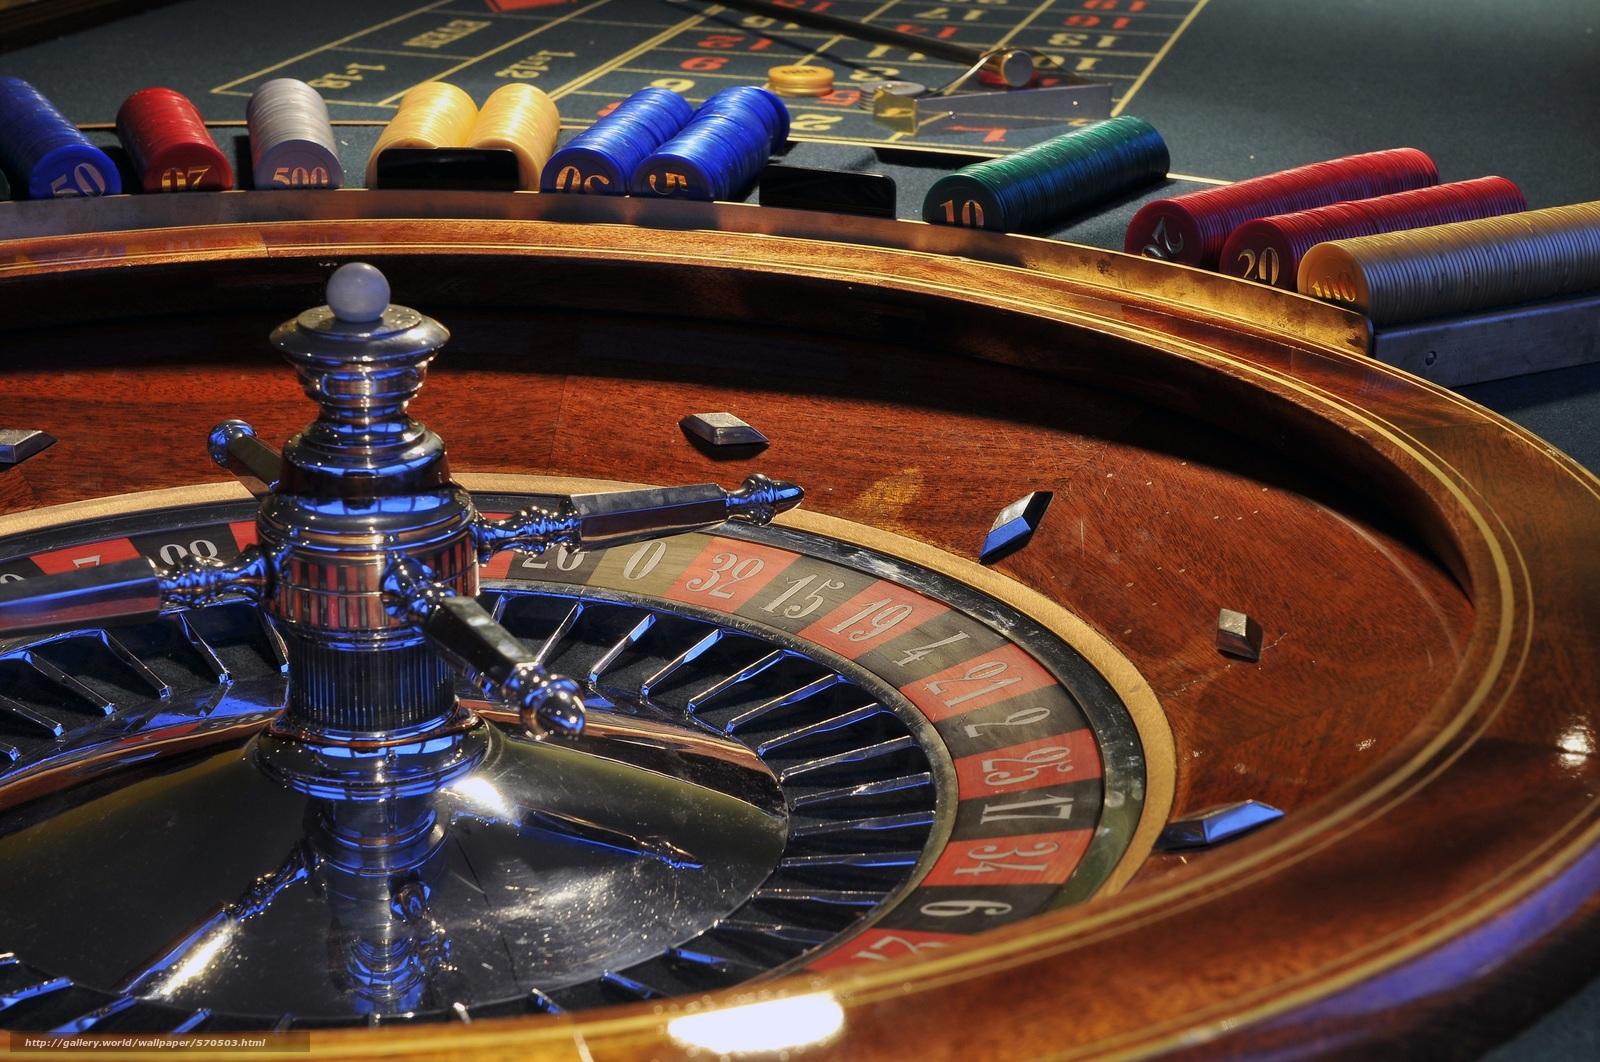 High limit roulette casinos